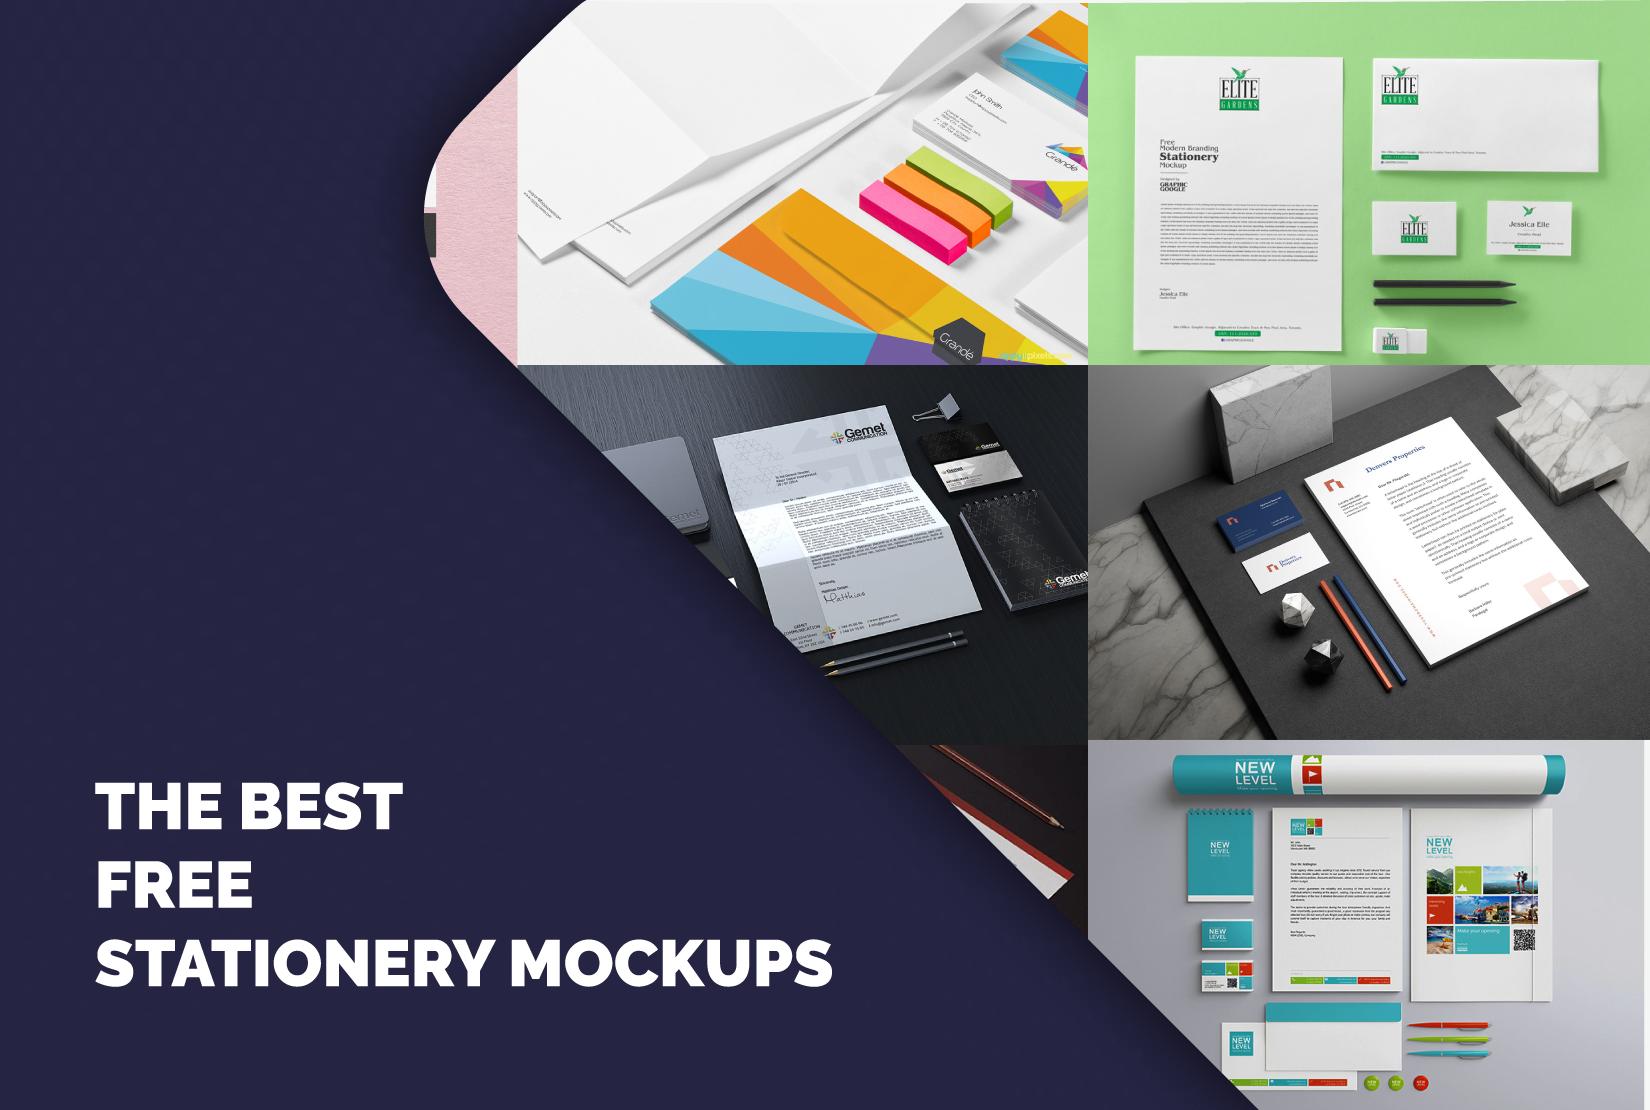 Free download Stationery Mockup